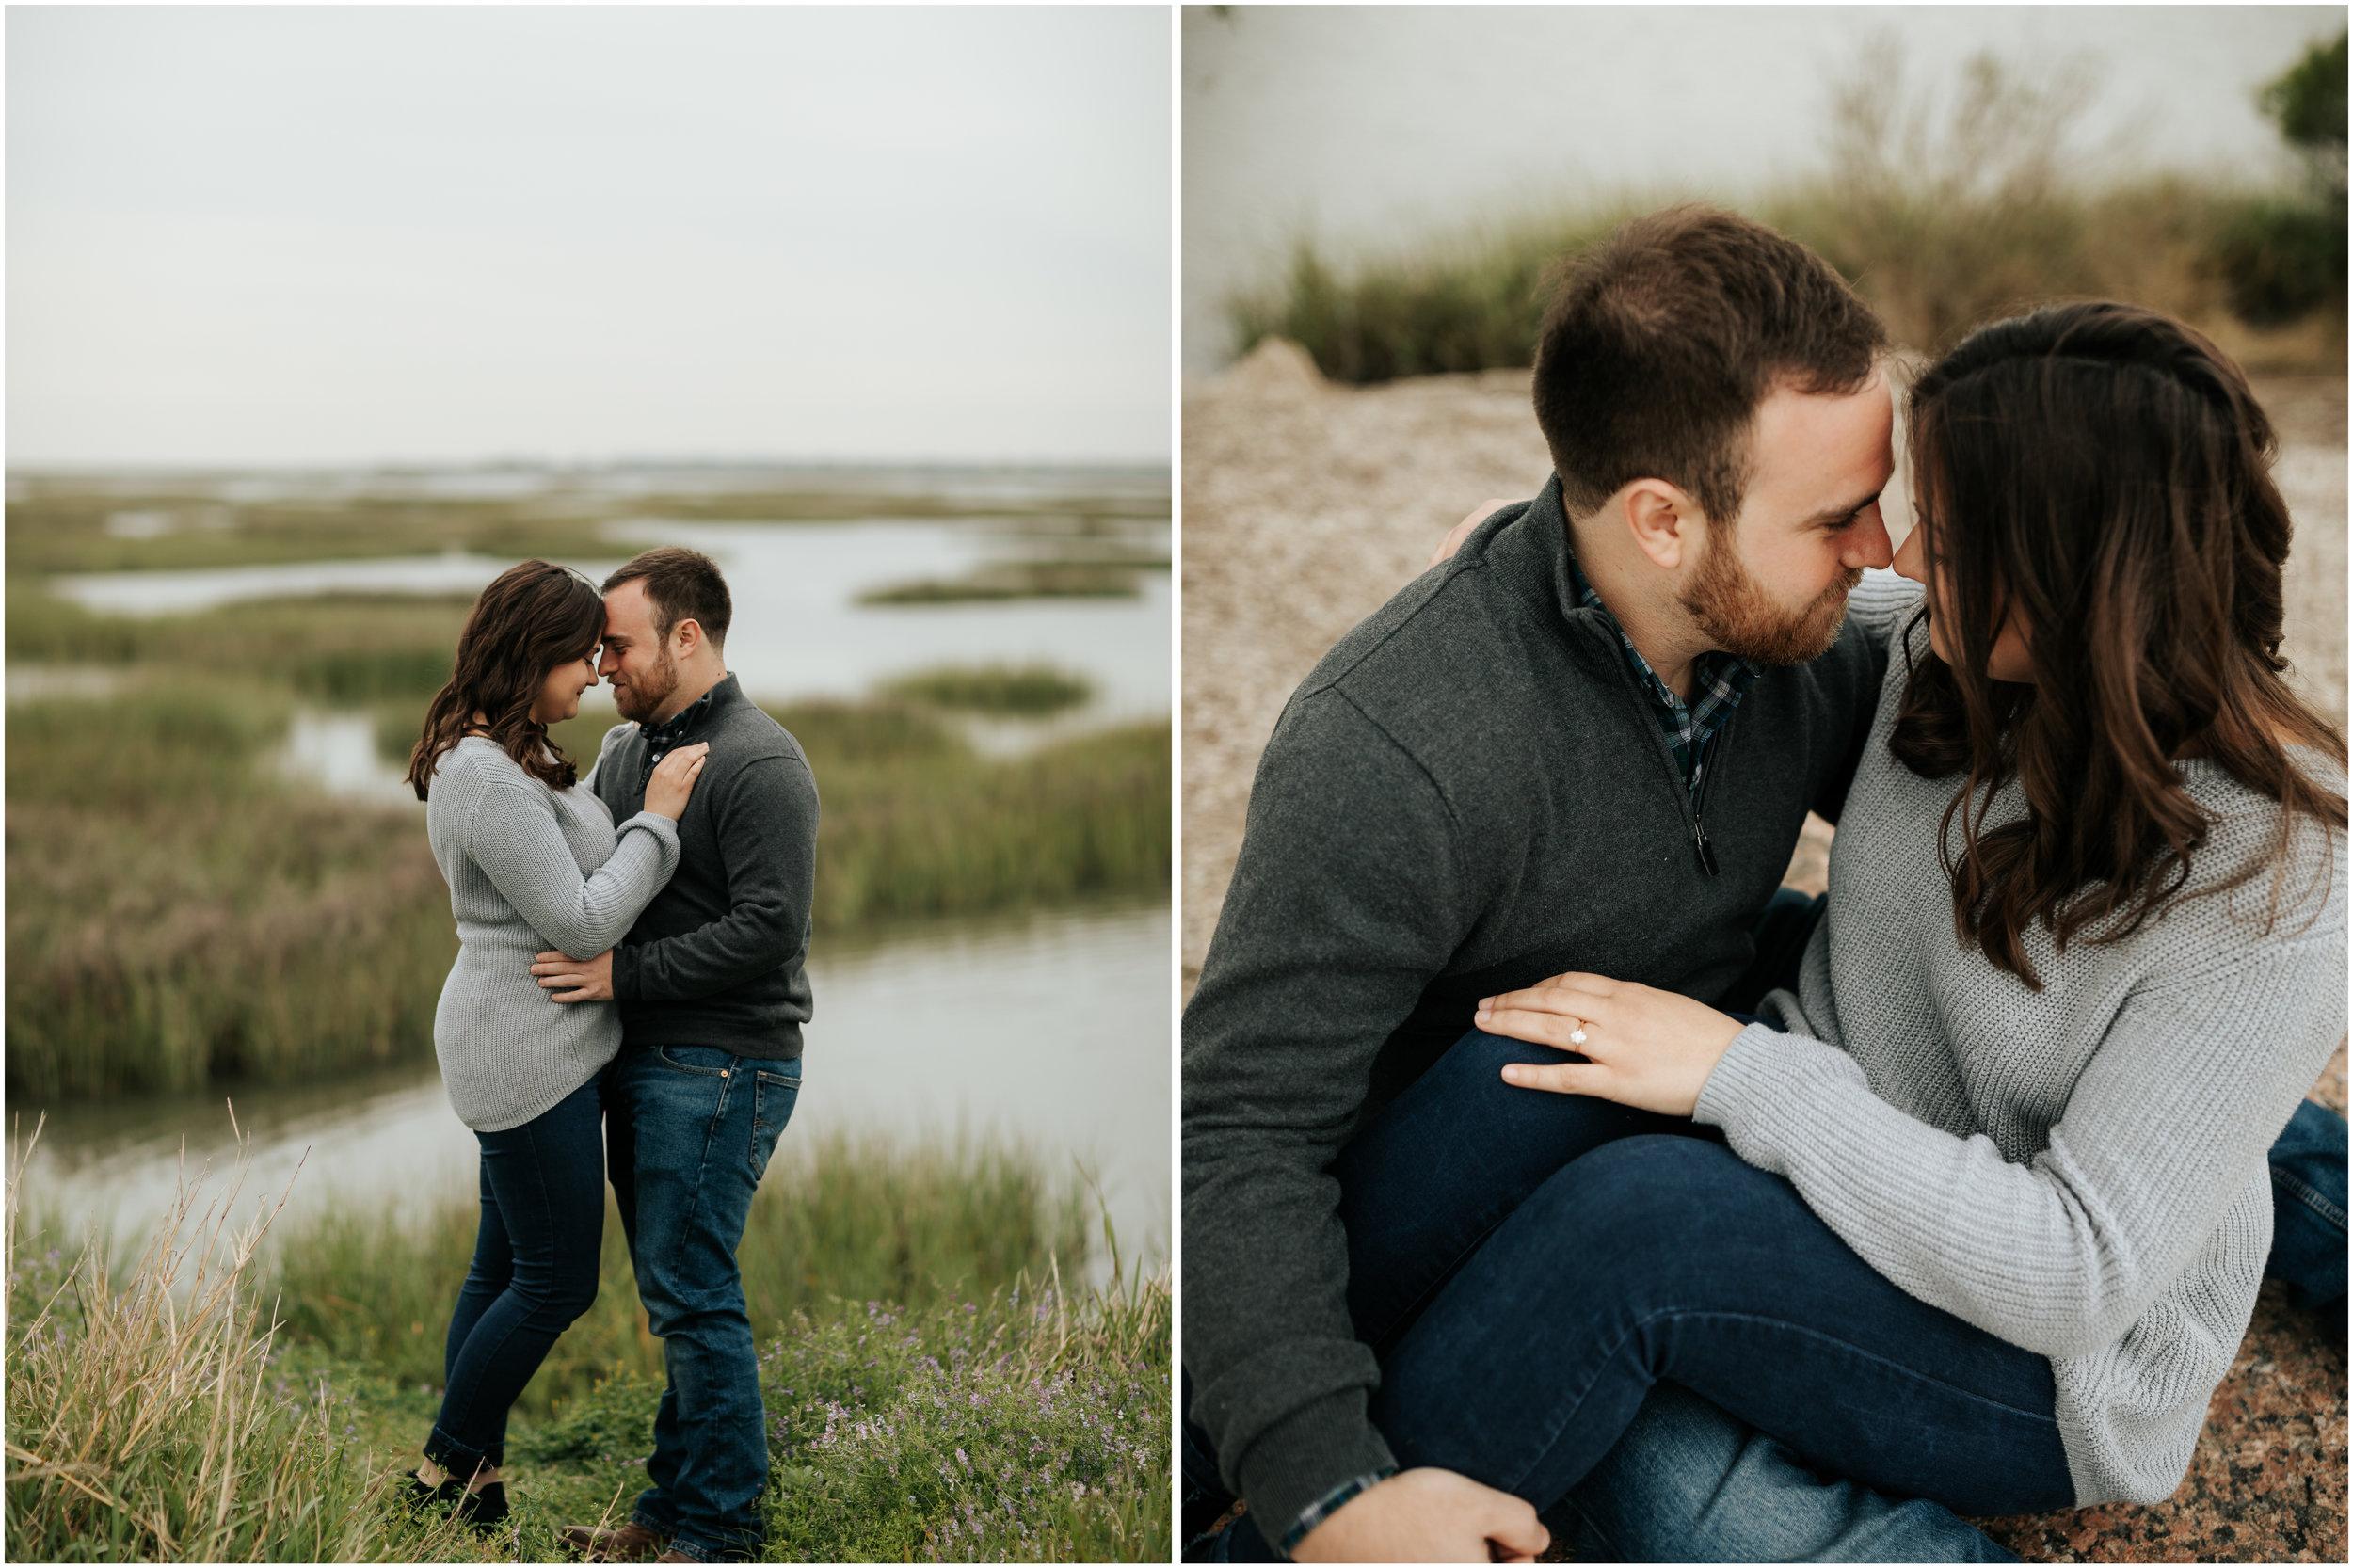 Leah Nicole Photography - Houston Wedding Photographer-Glassel Art School Engagement Session- Houston Wedding Photographer - Galveston Engagement 1.jpg